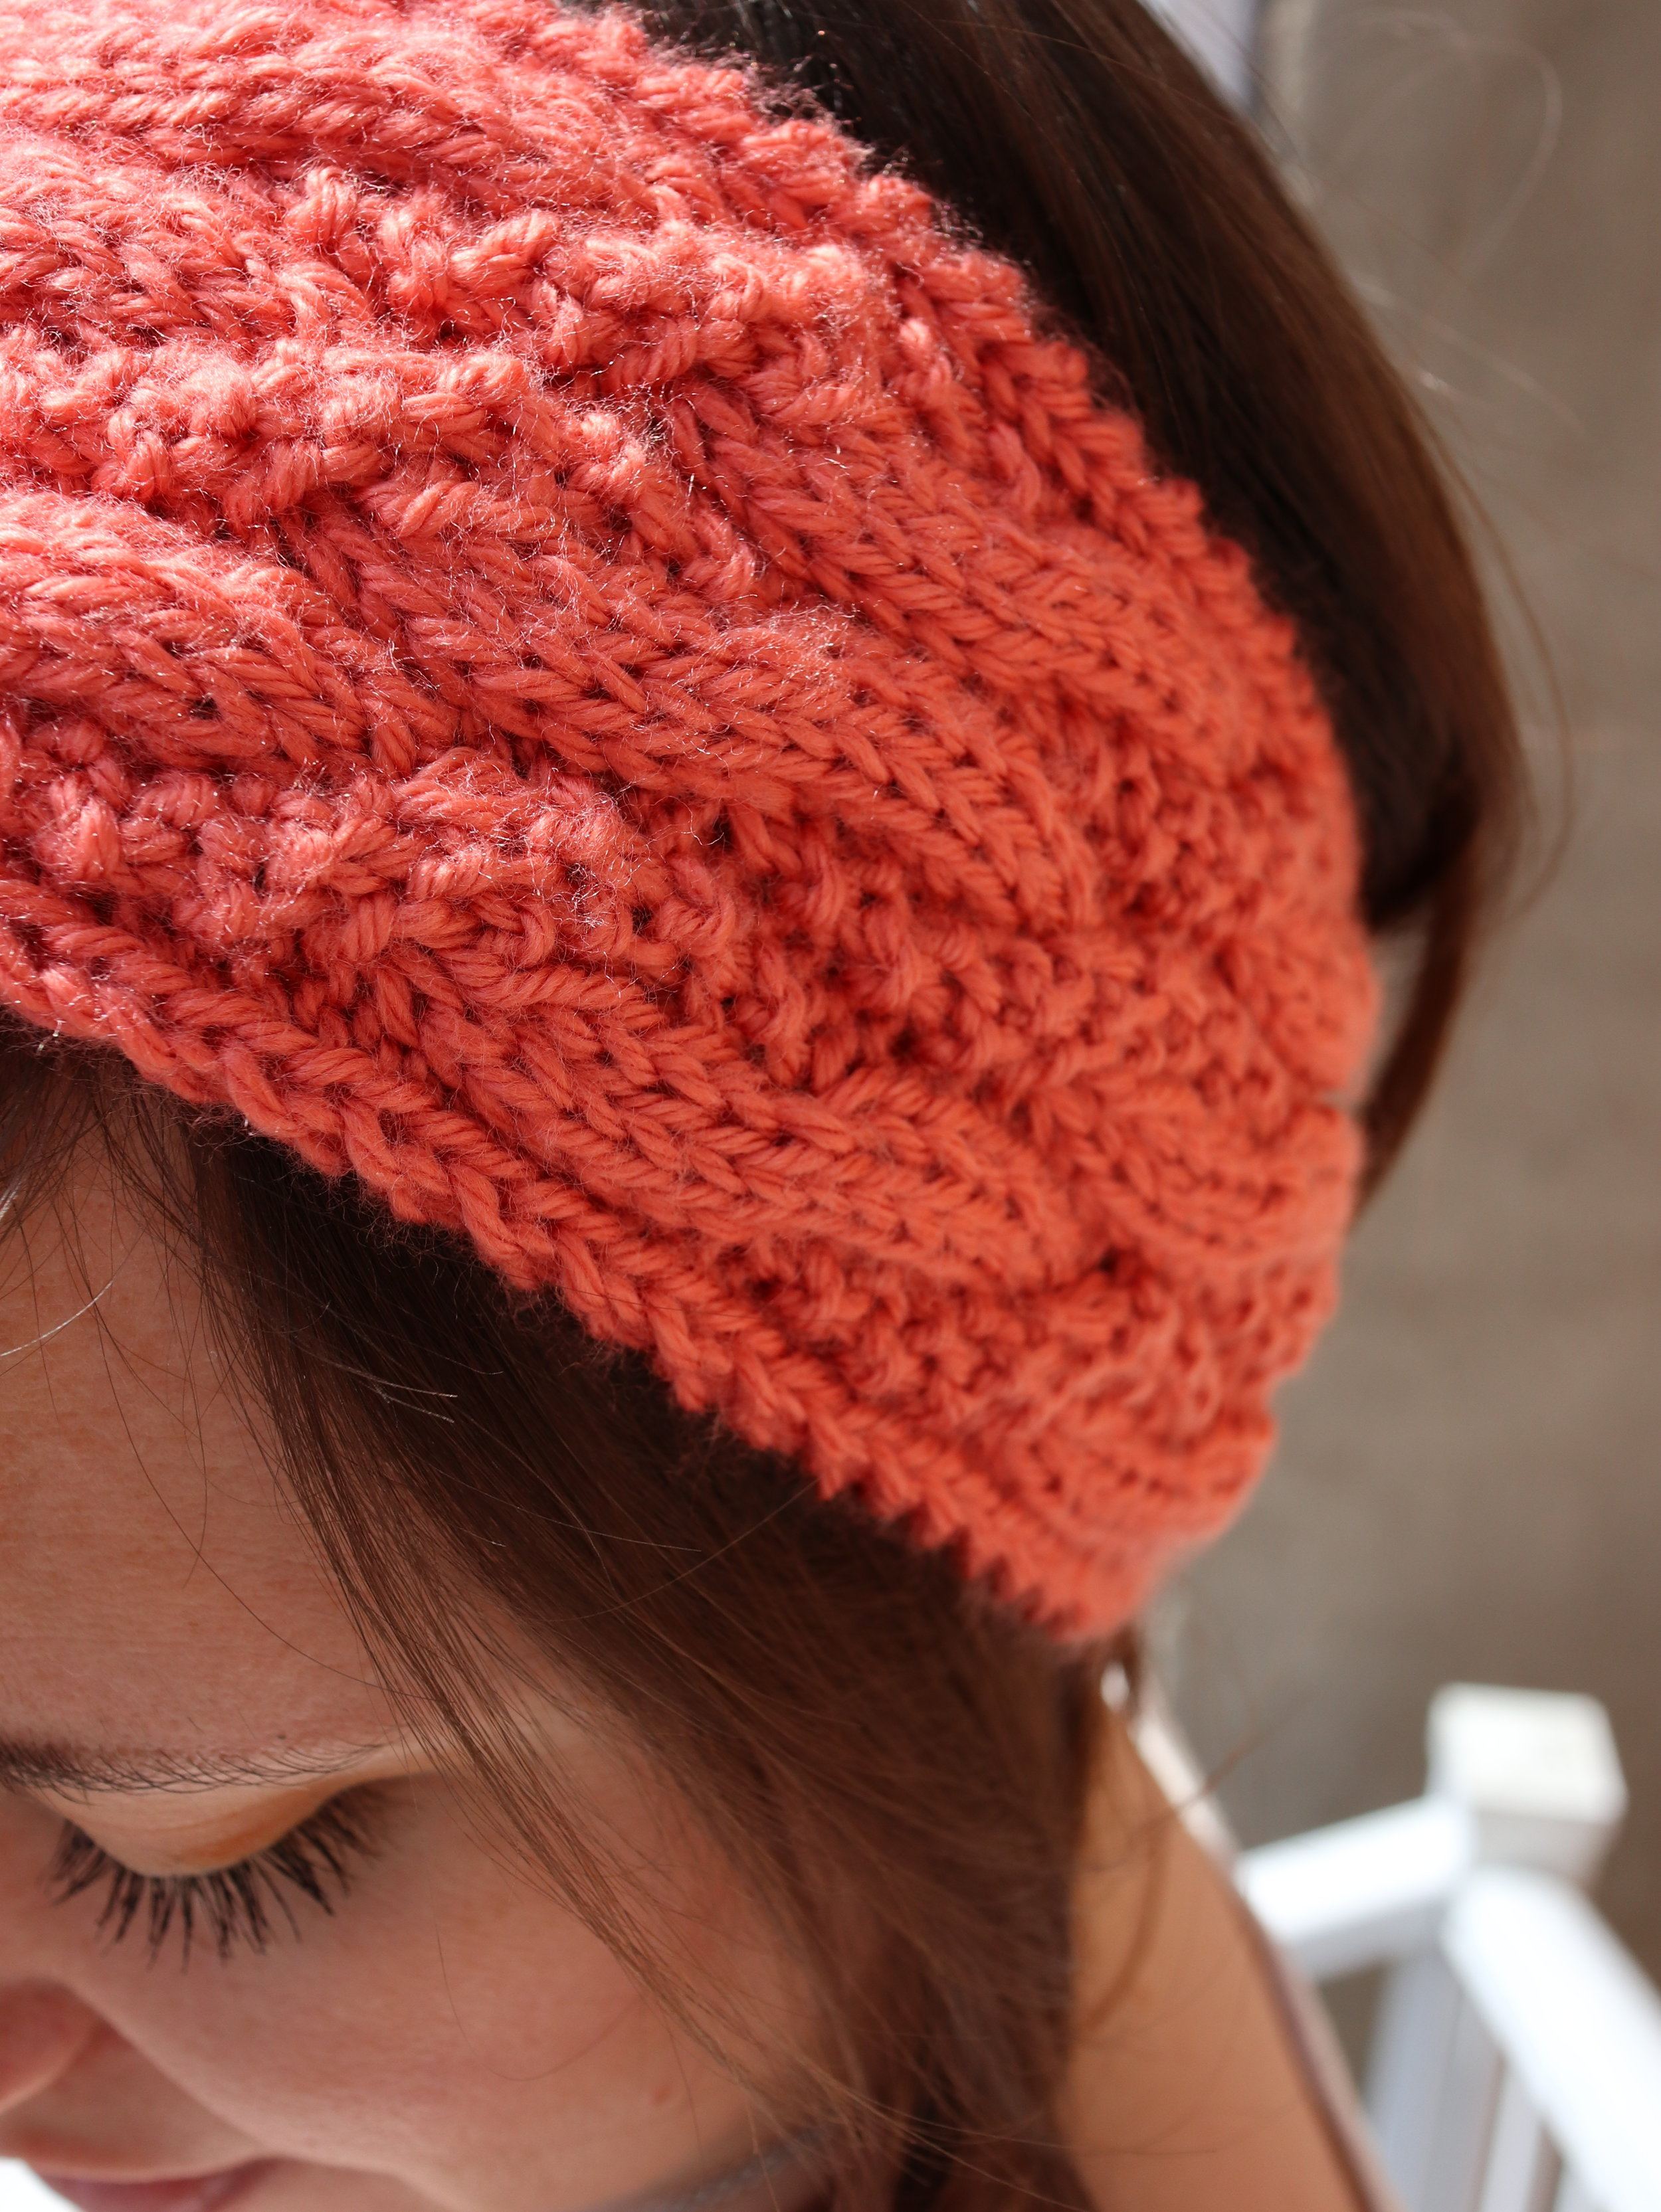 FREE PATTERN - SSC headband - Ravin Sekai Designs3